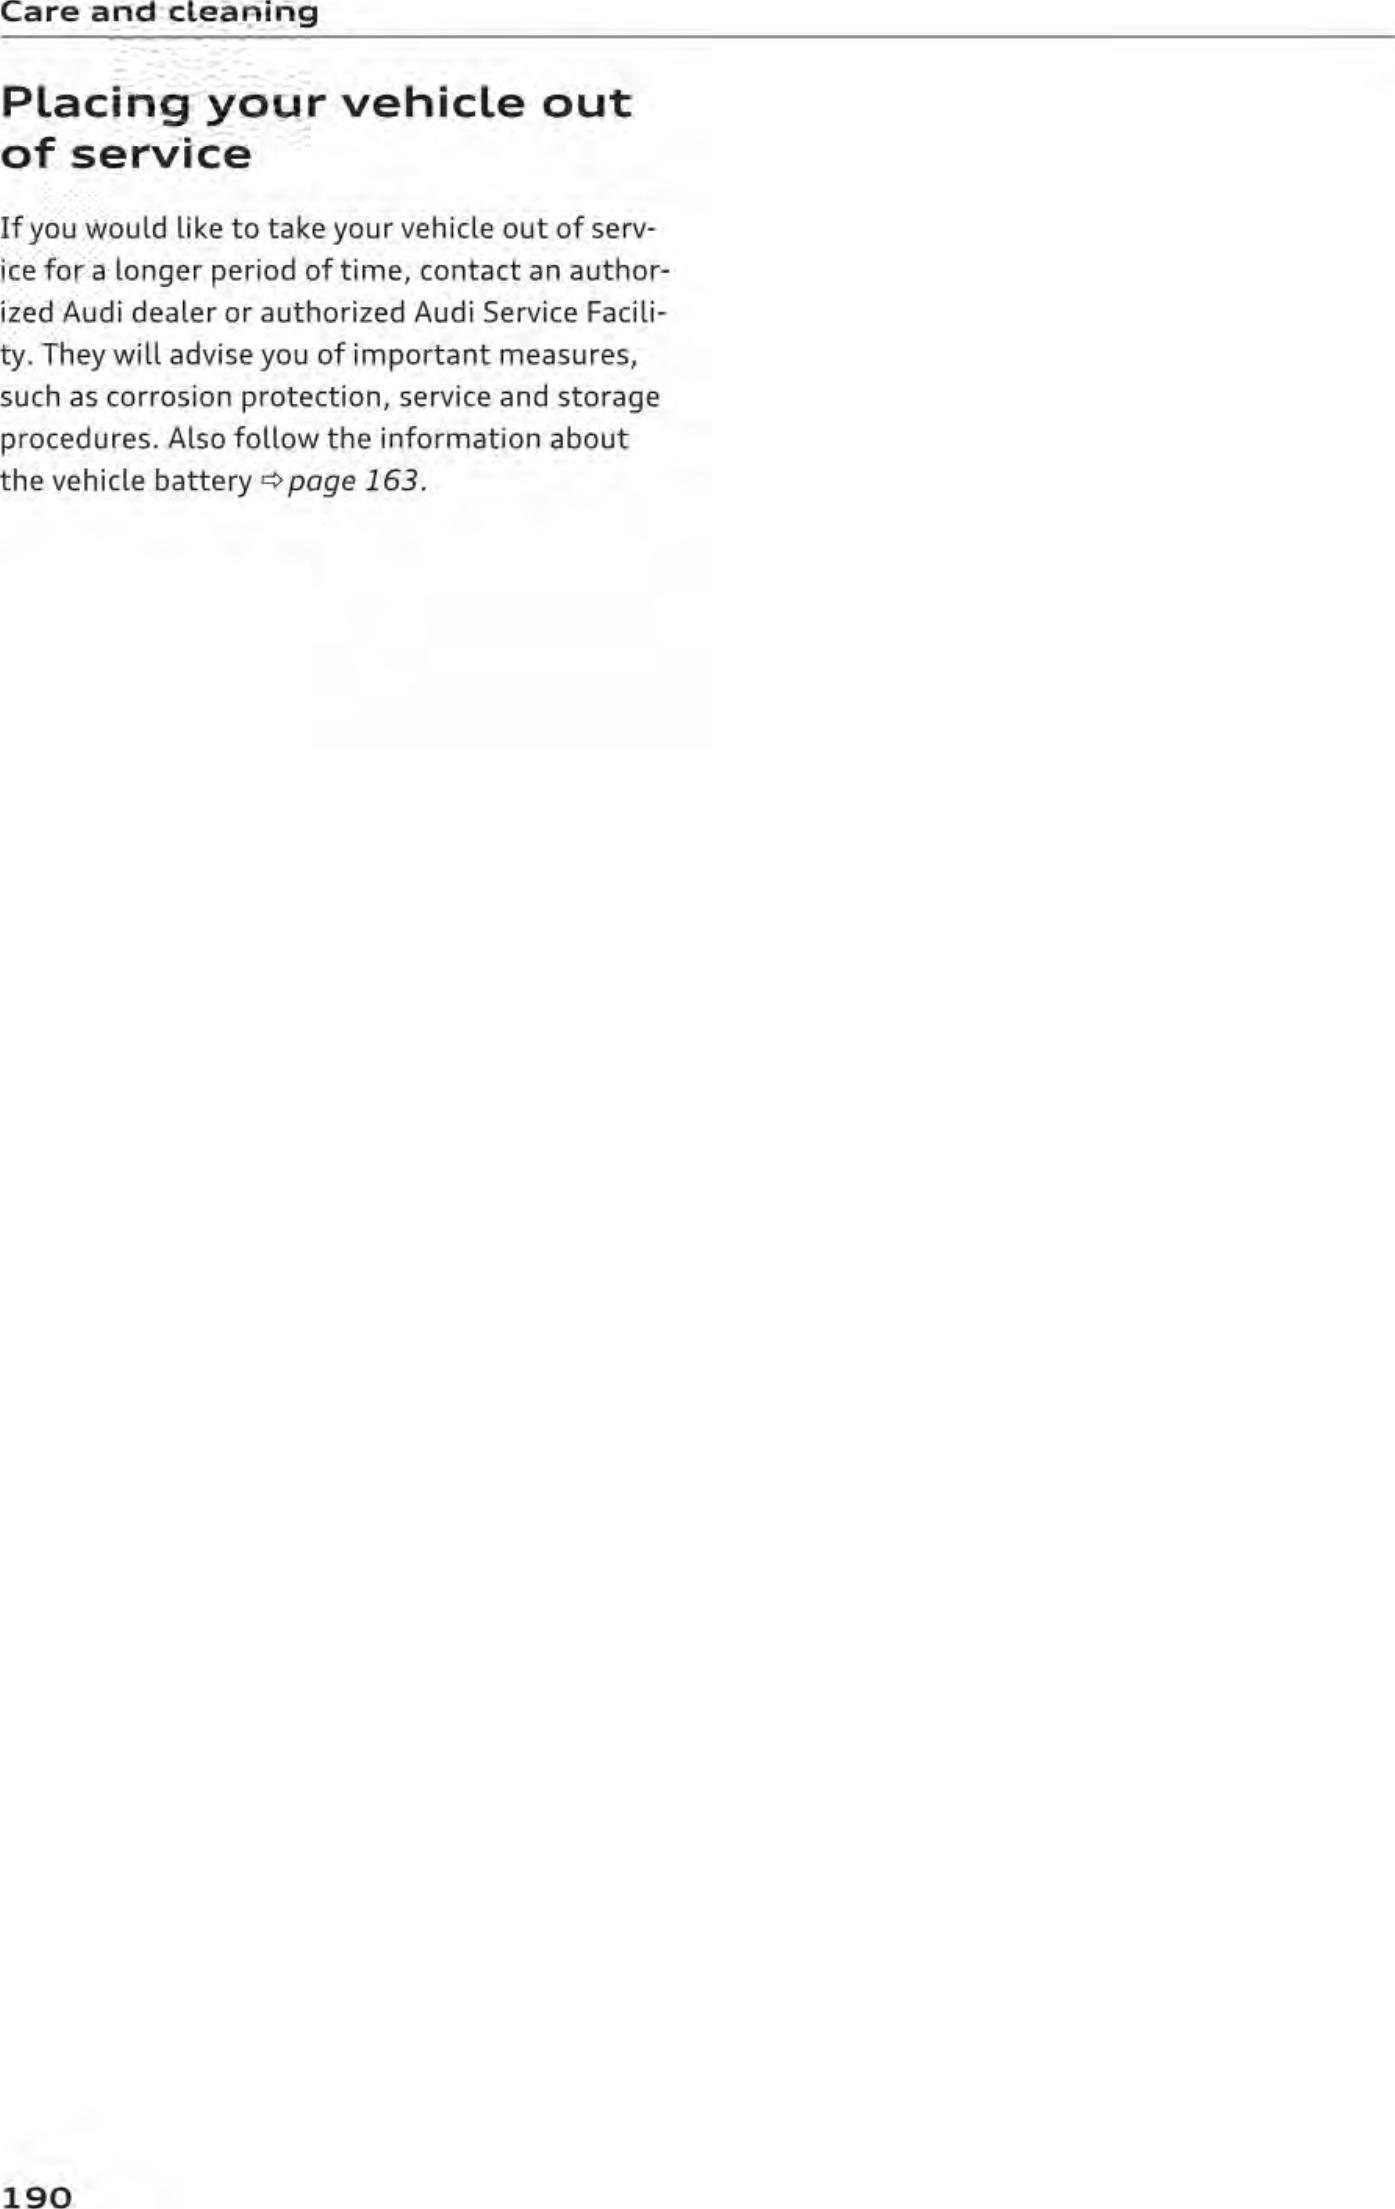 Robert Bosch Car Multimedia AUFPK20 Instrument cluster with